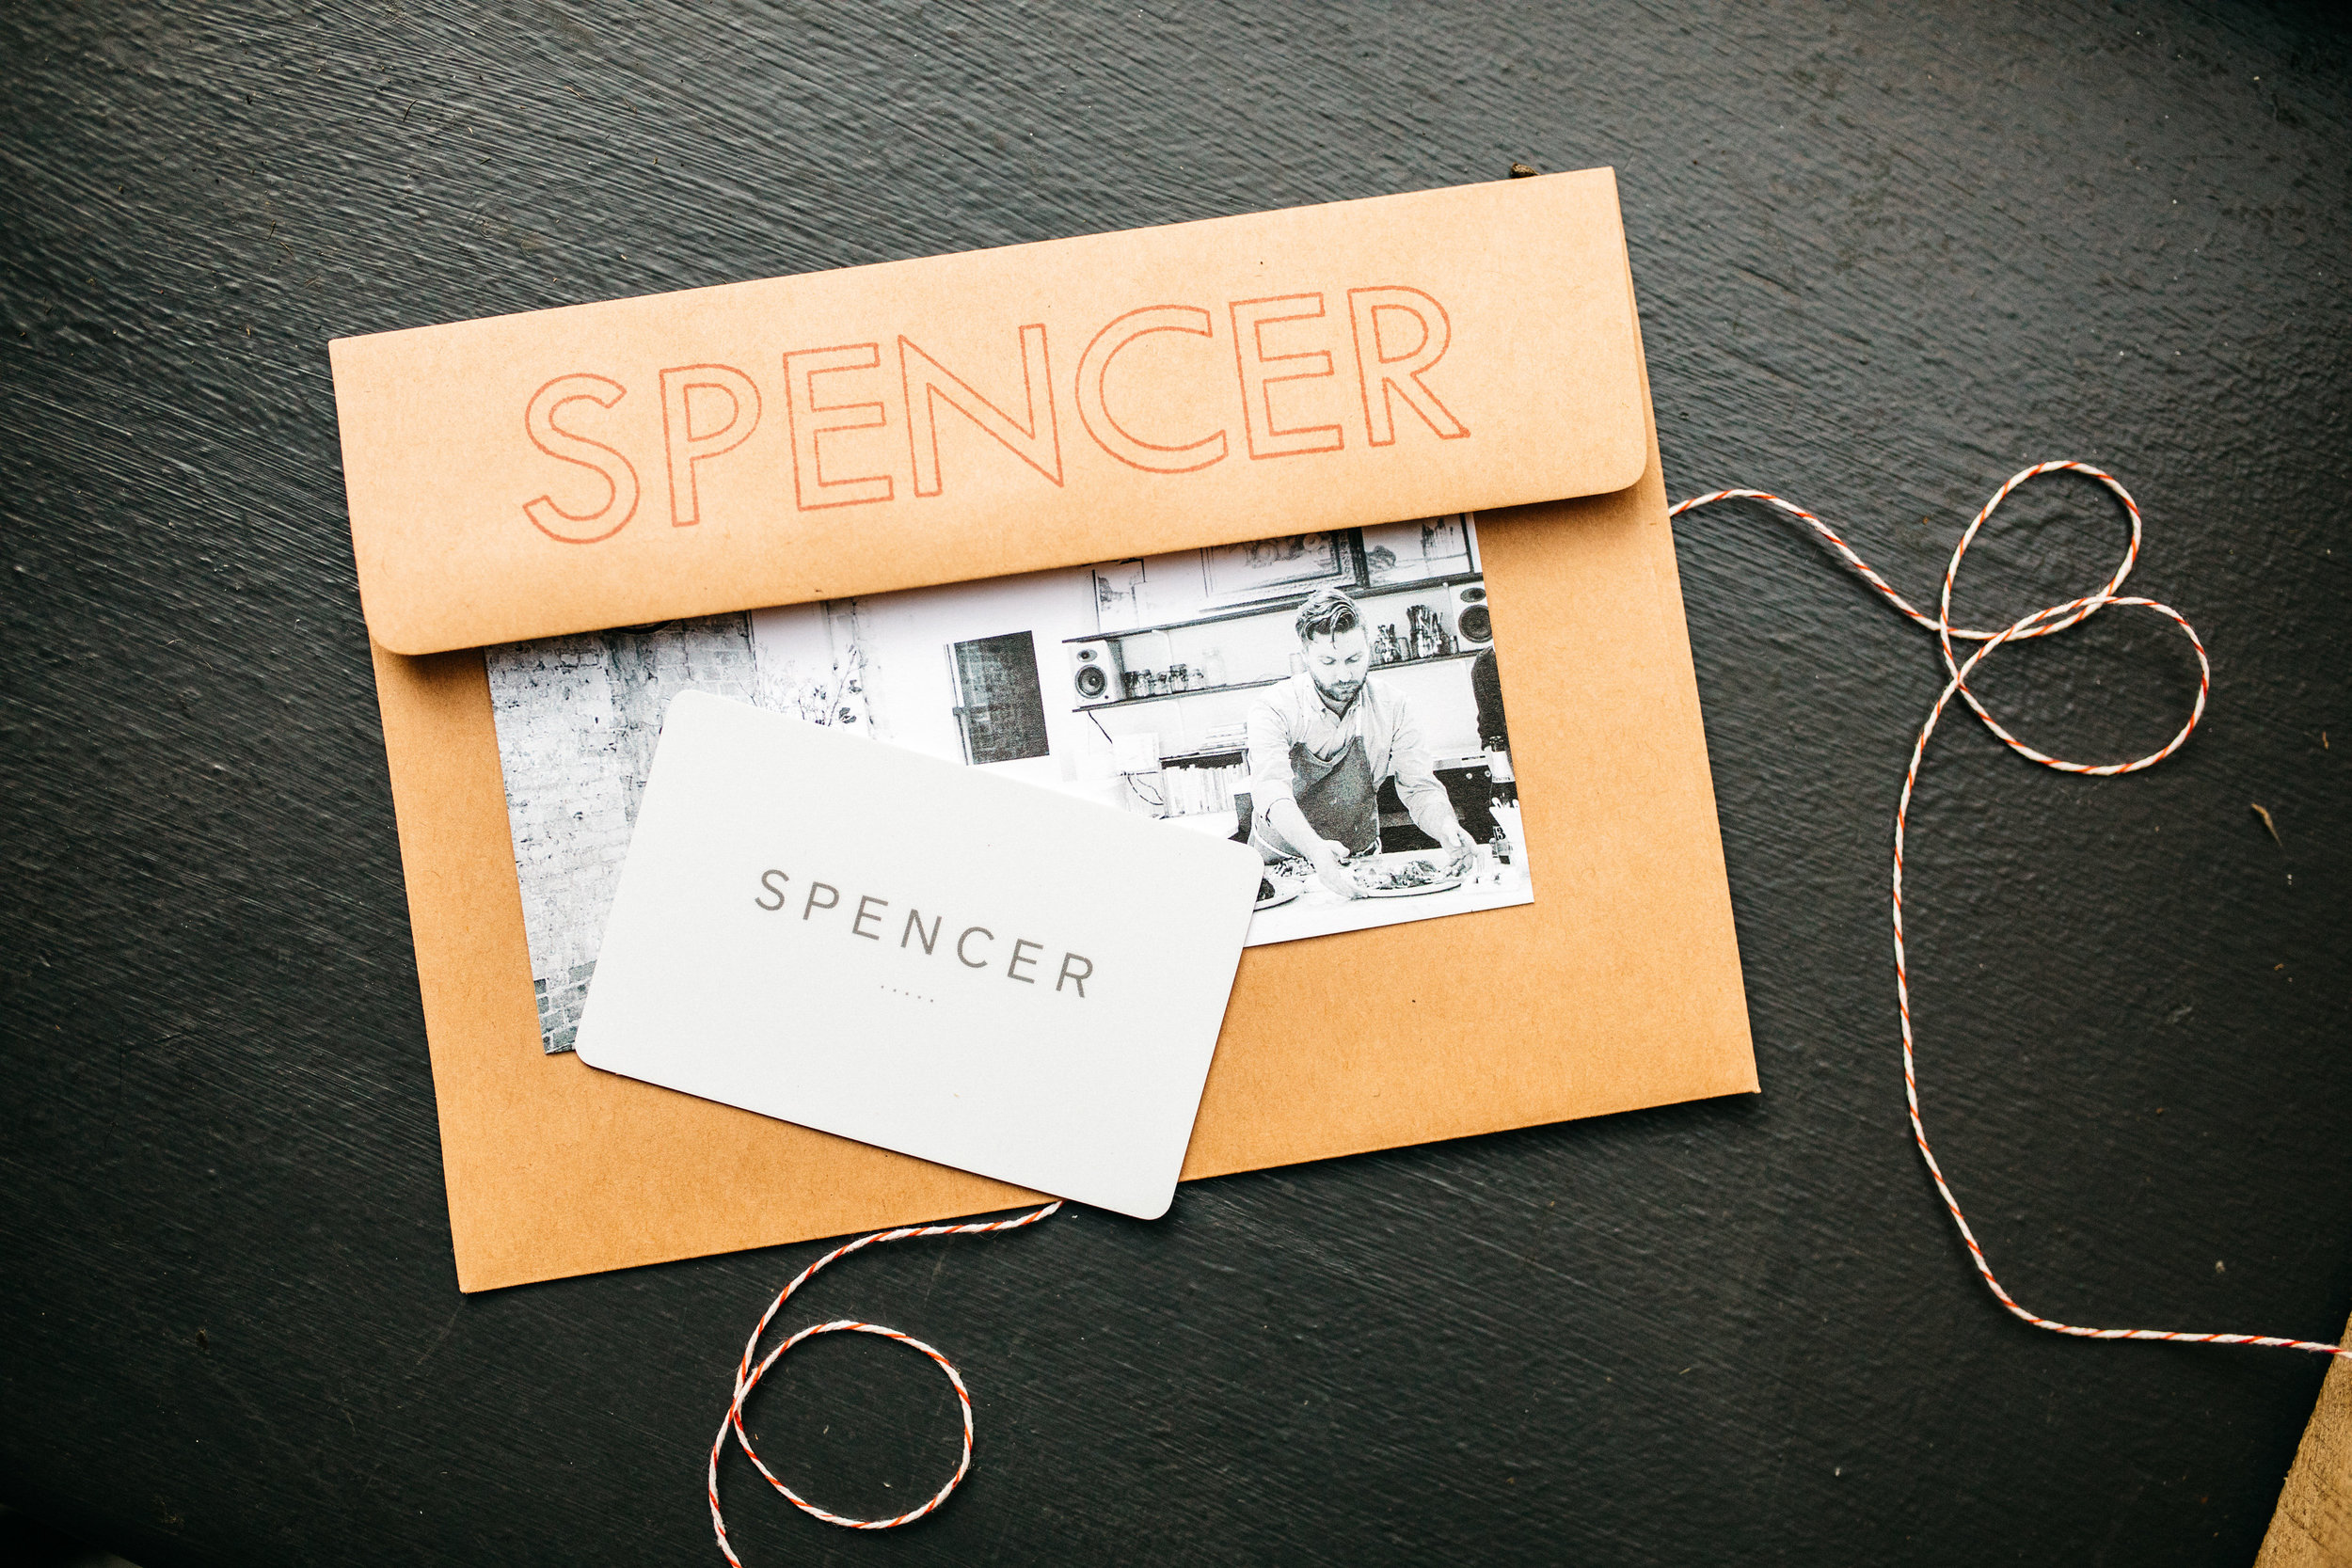 spencer-12-17-25 copy.jpg